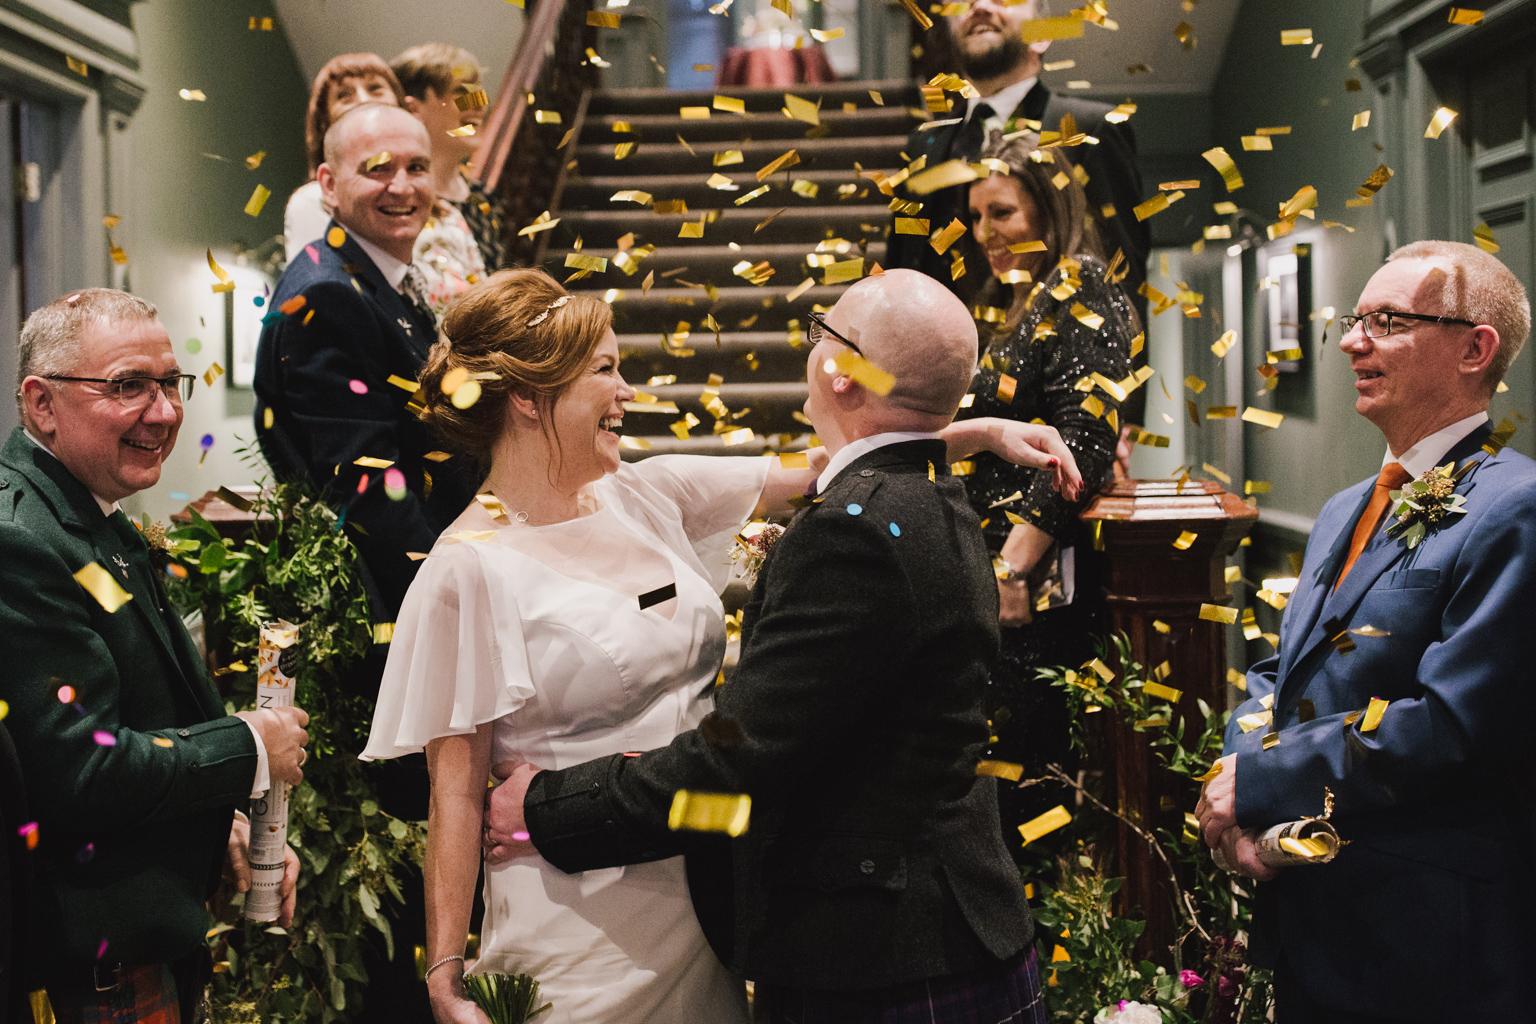 confetti canon at One Devonshire Gardens Glasgow wedding